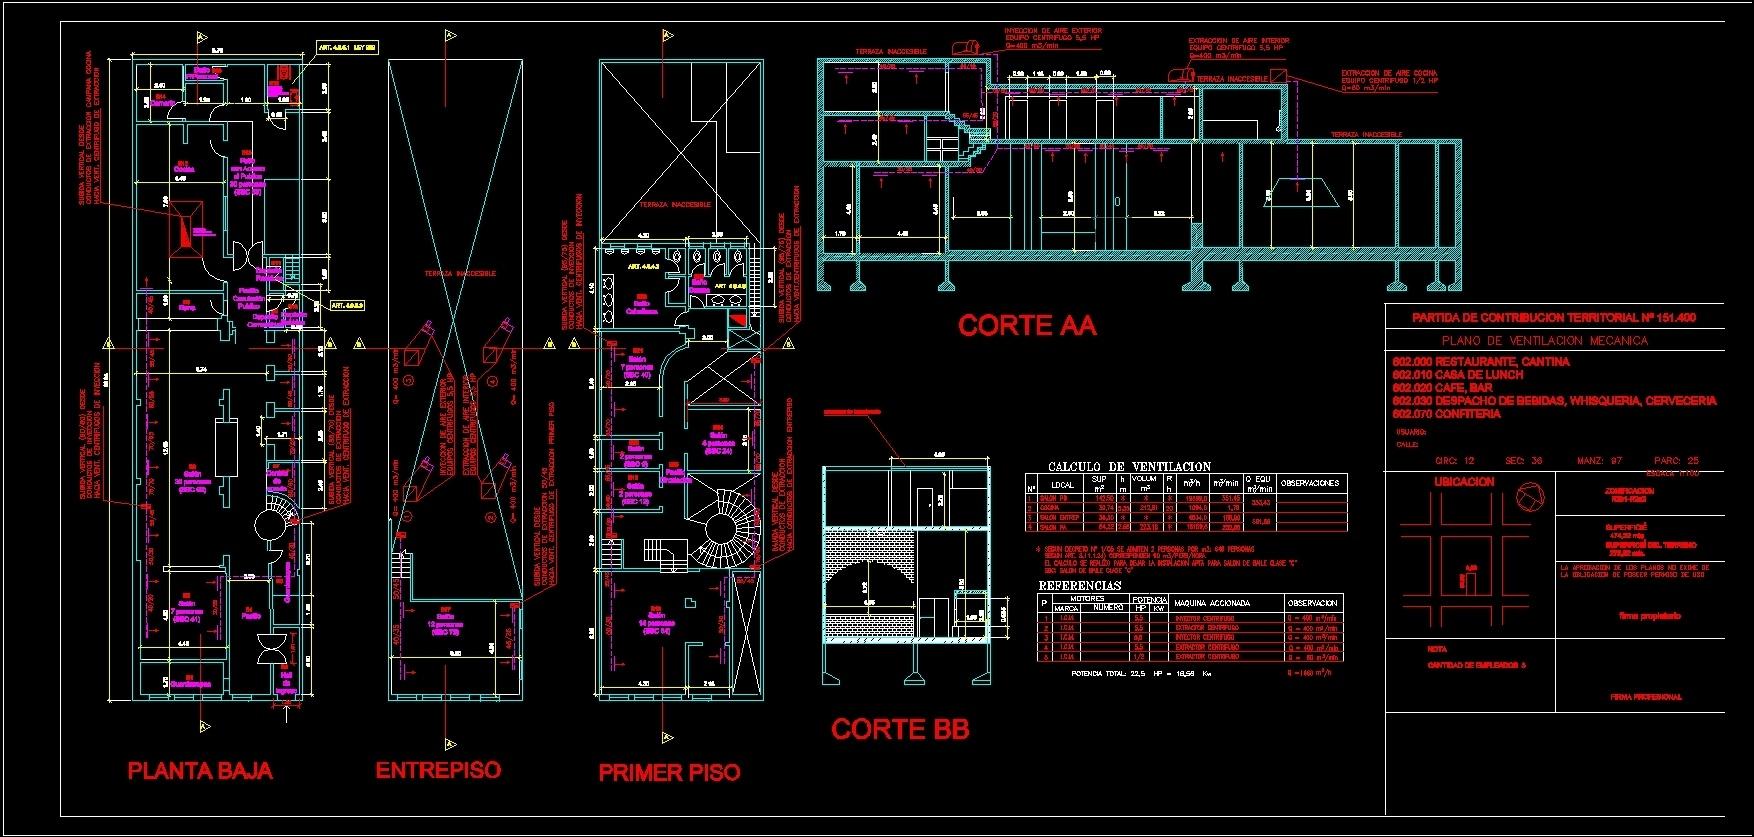 Electromechanical Ventilation Plane Dwg Block For Autocad